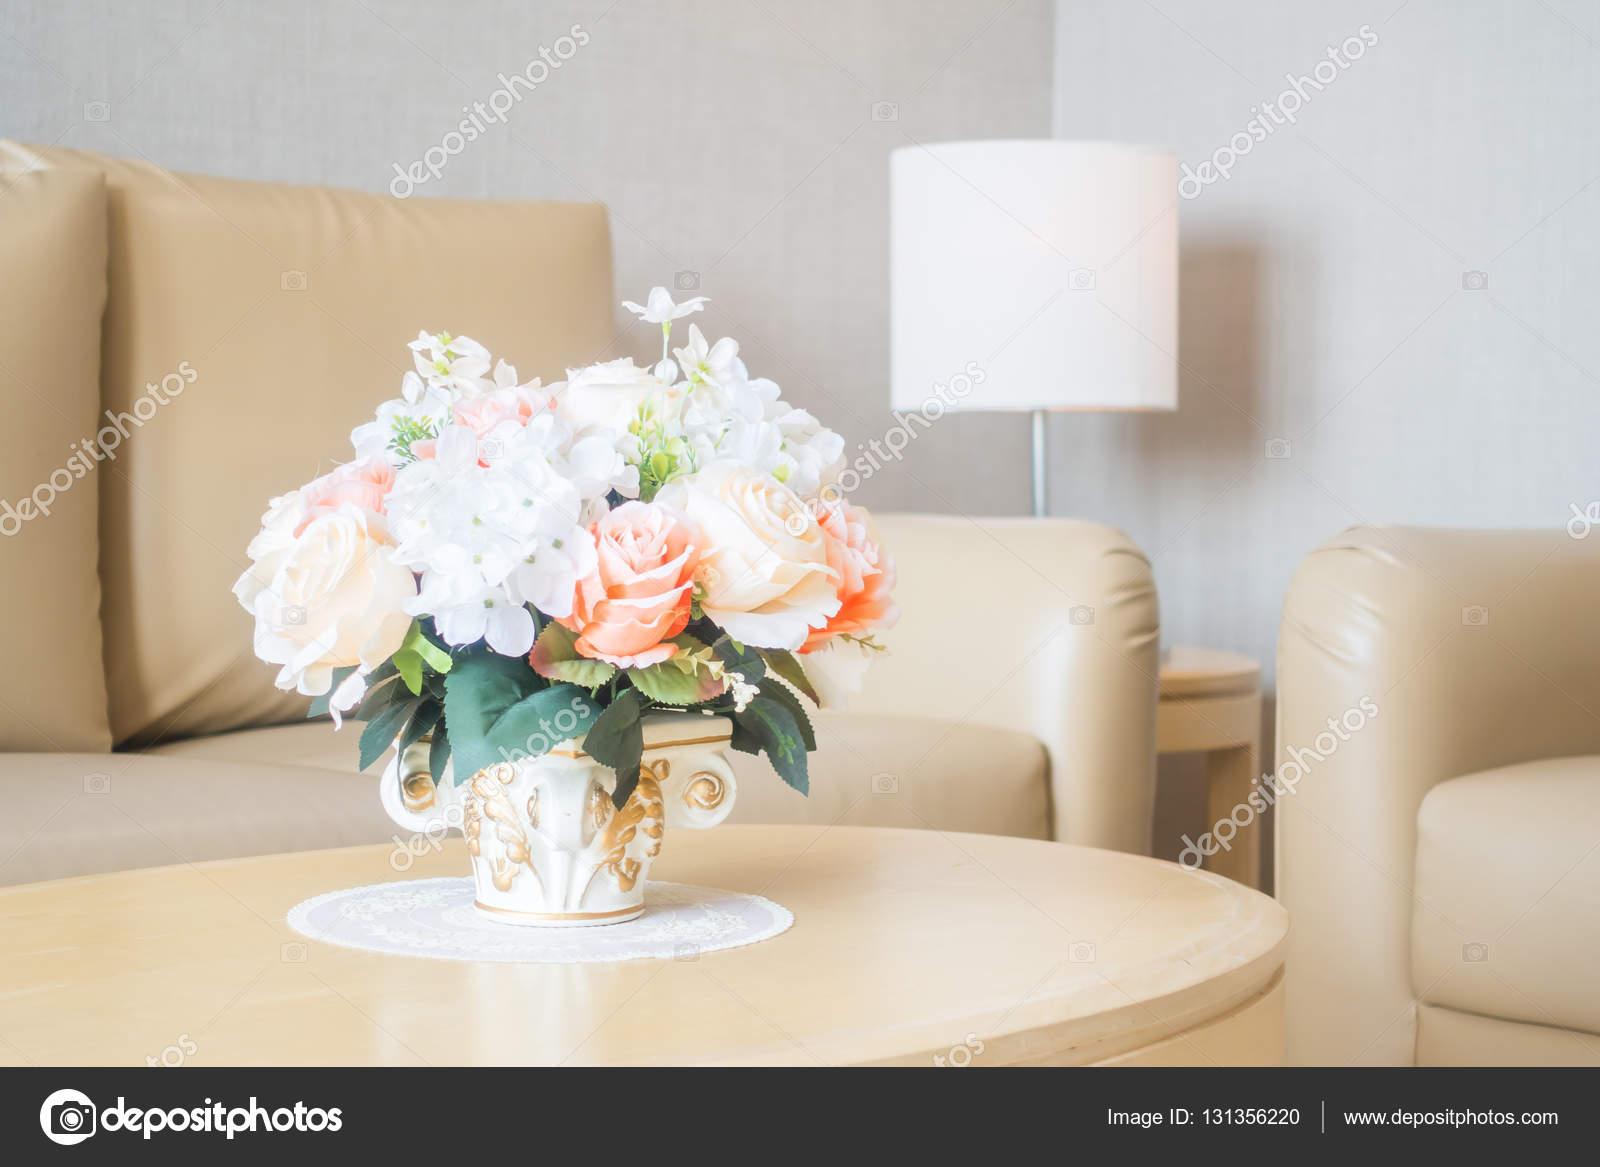 Bloemenvaas op tafeldecoratie in de woonkamer binnenkant — Stockfoto ...